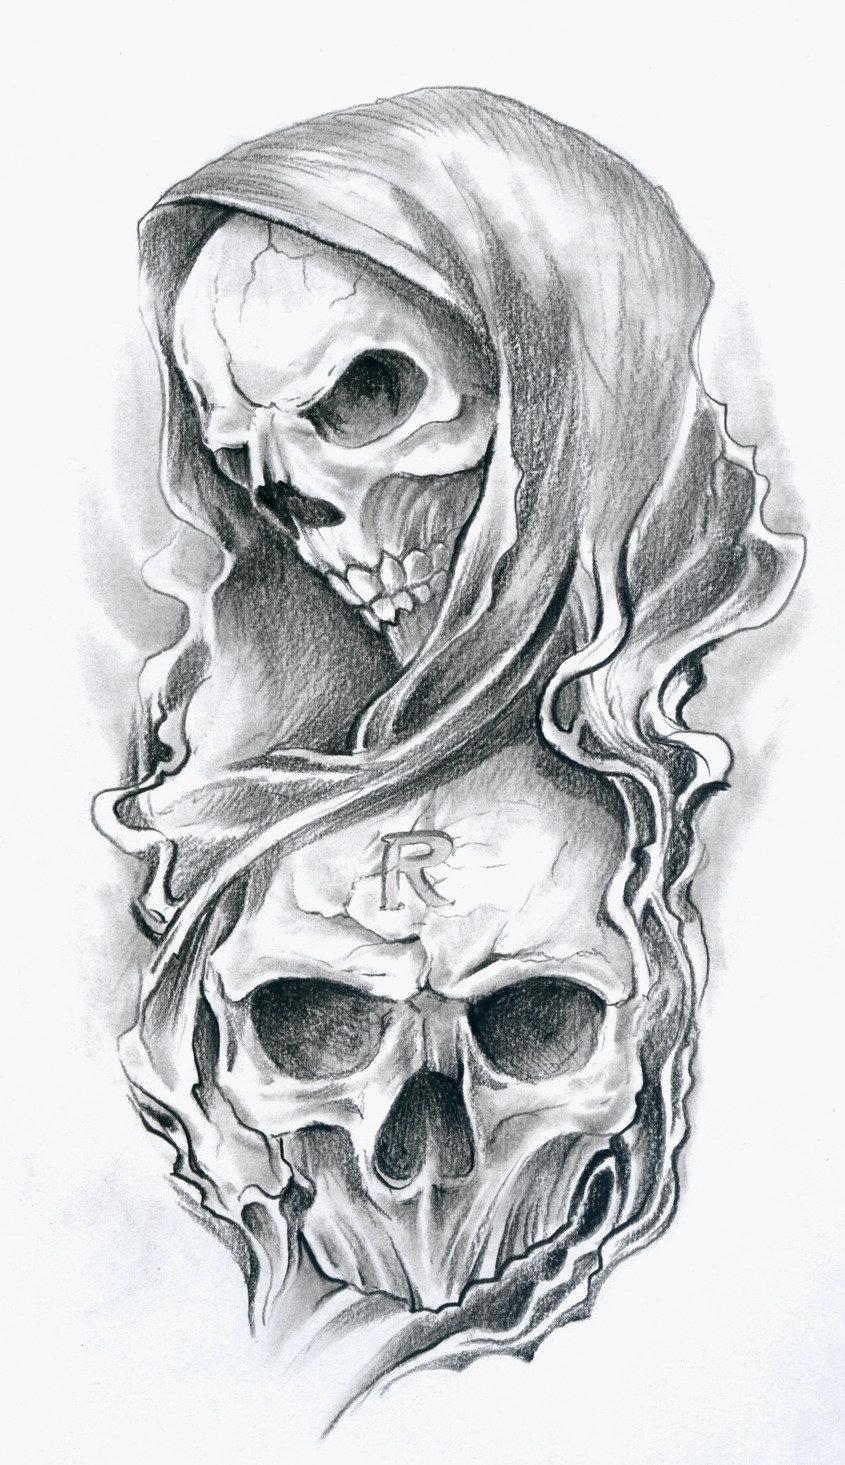 Drawn smoke skull Artists more skulls tattoos Find